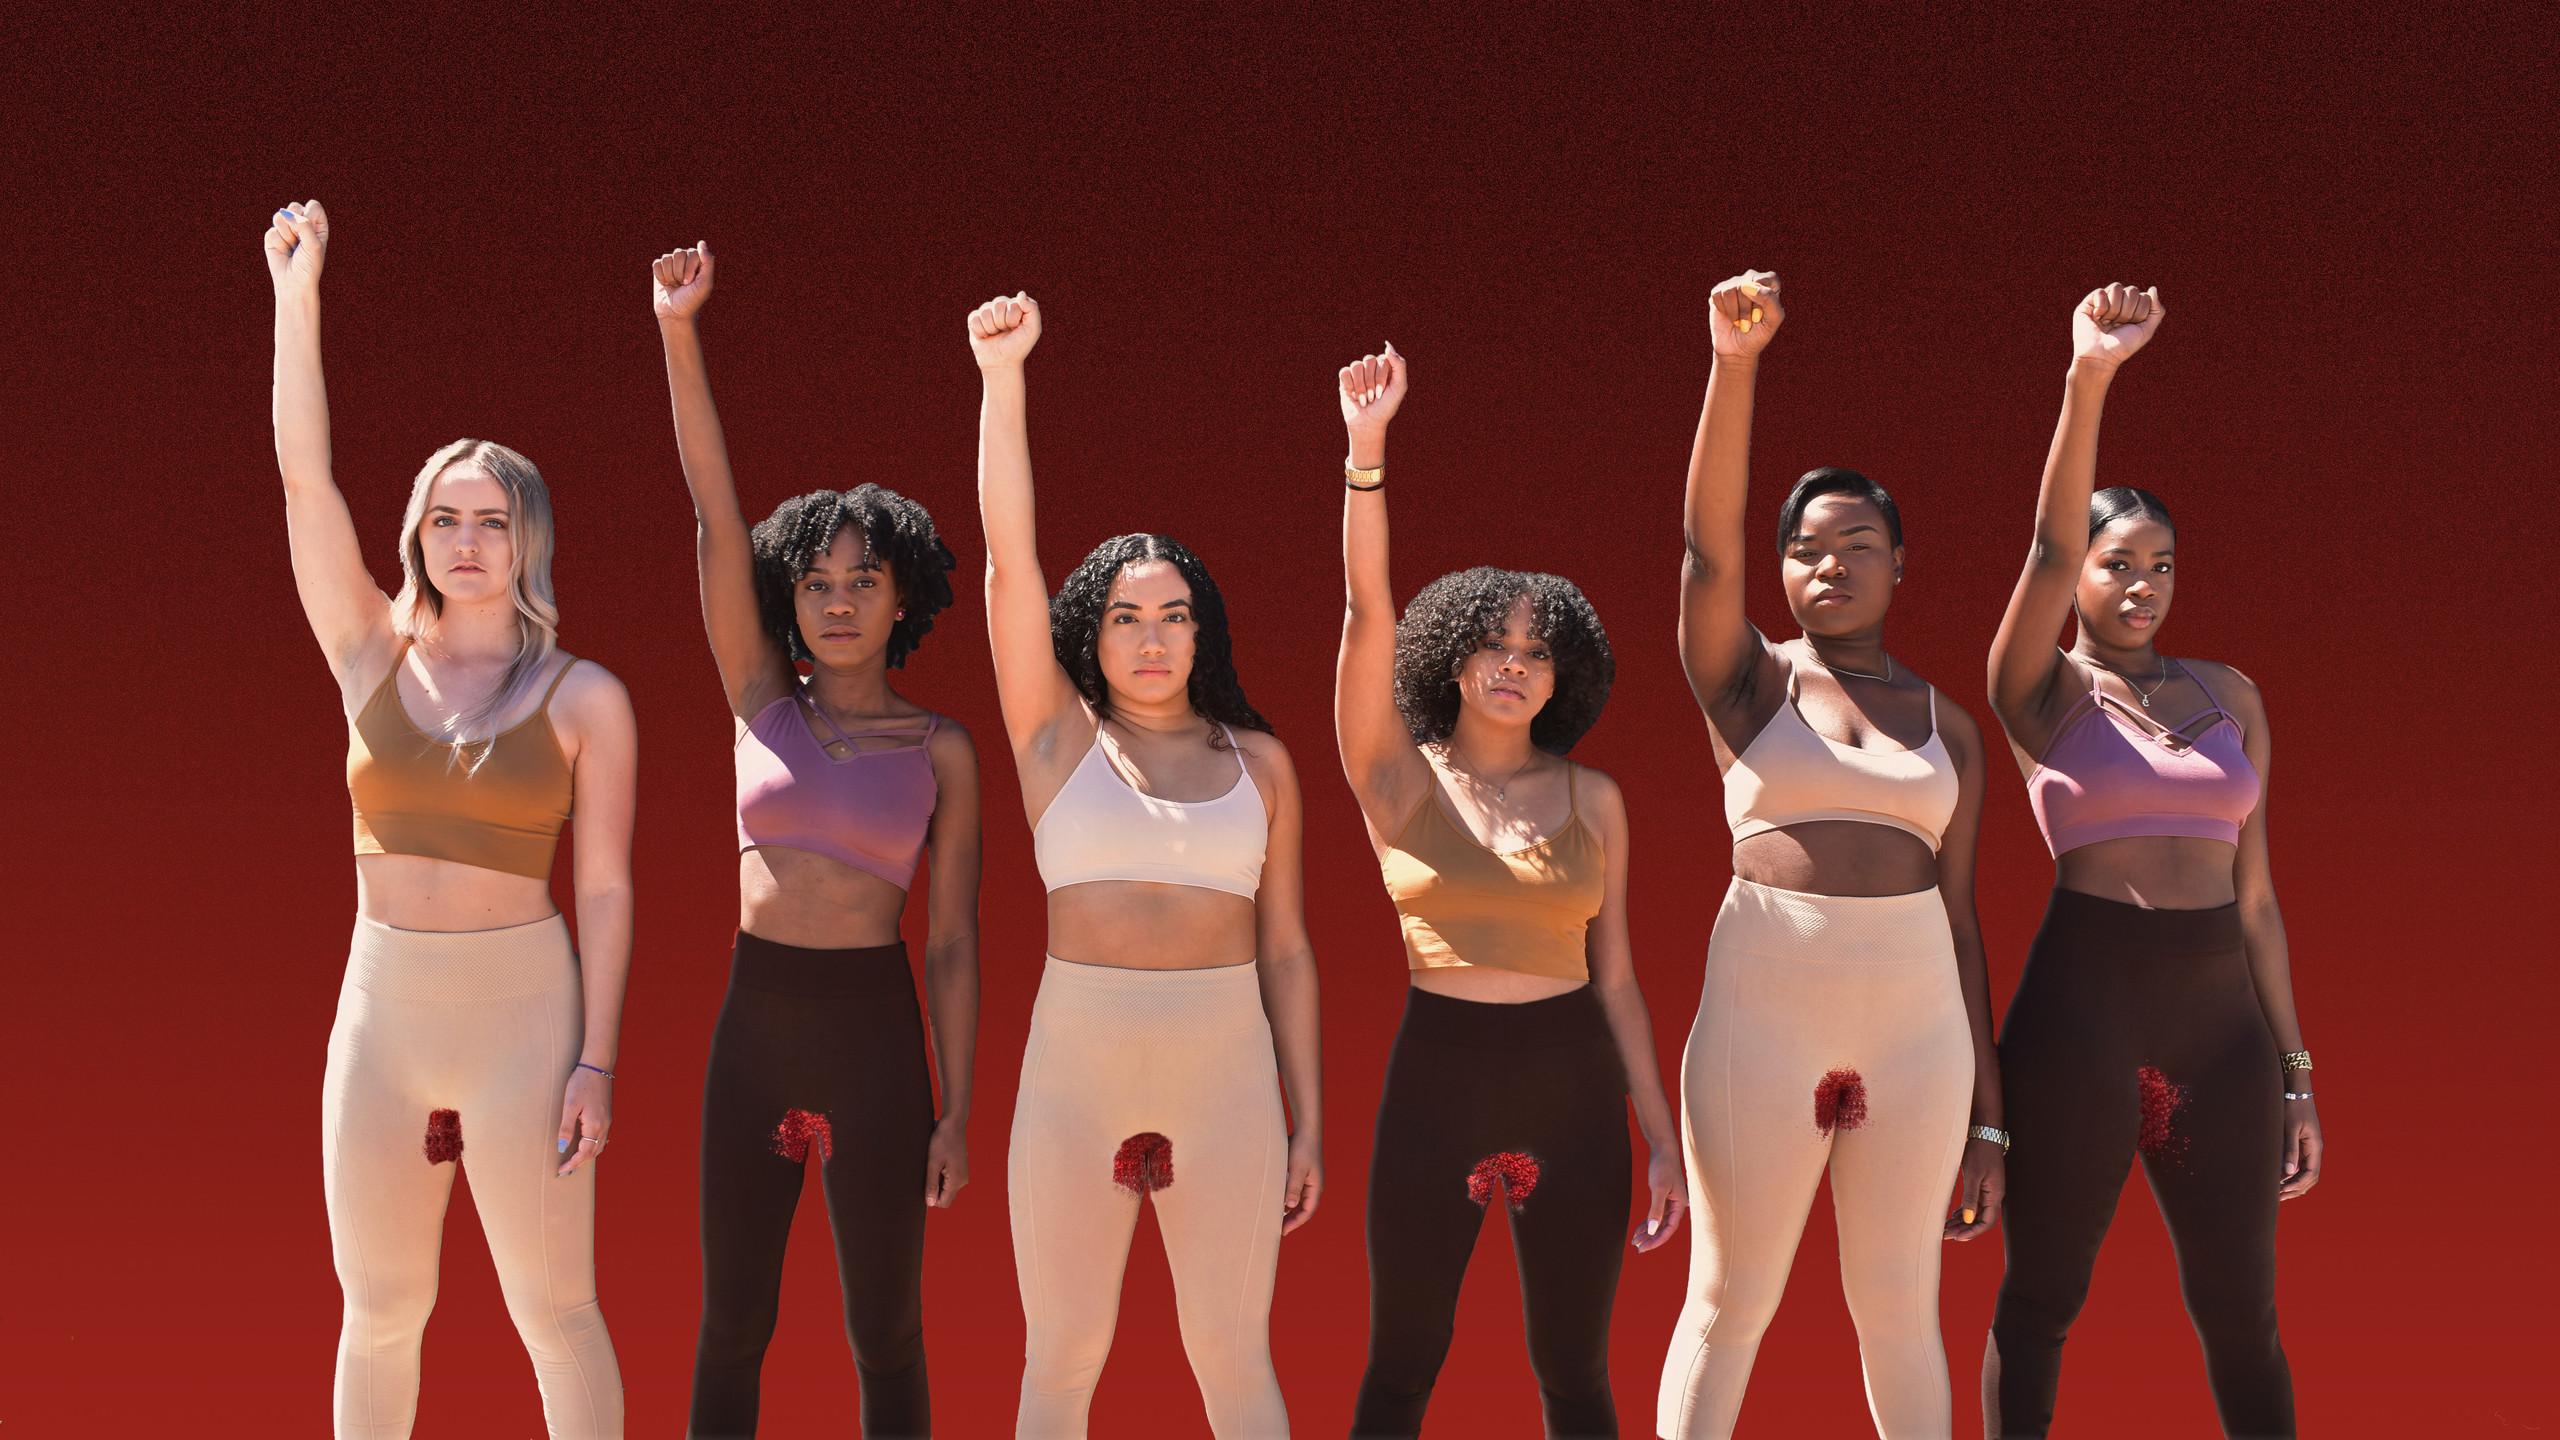 NITE 008 : Pussy Power shot by Dreina Bautista, Feminist Summit, FIU